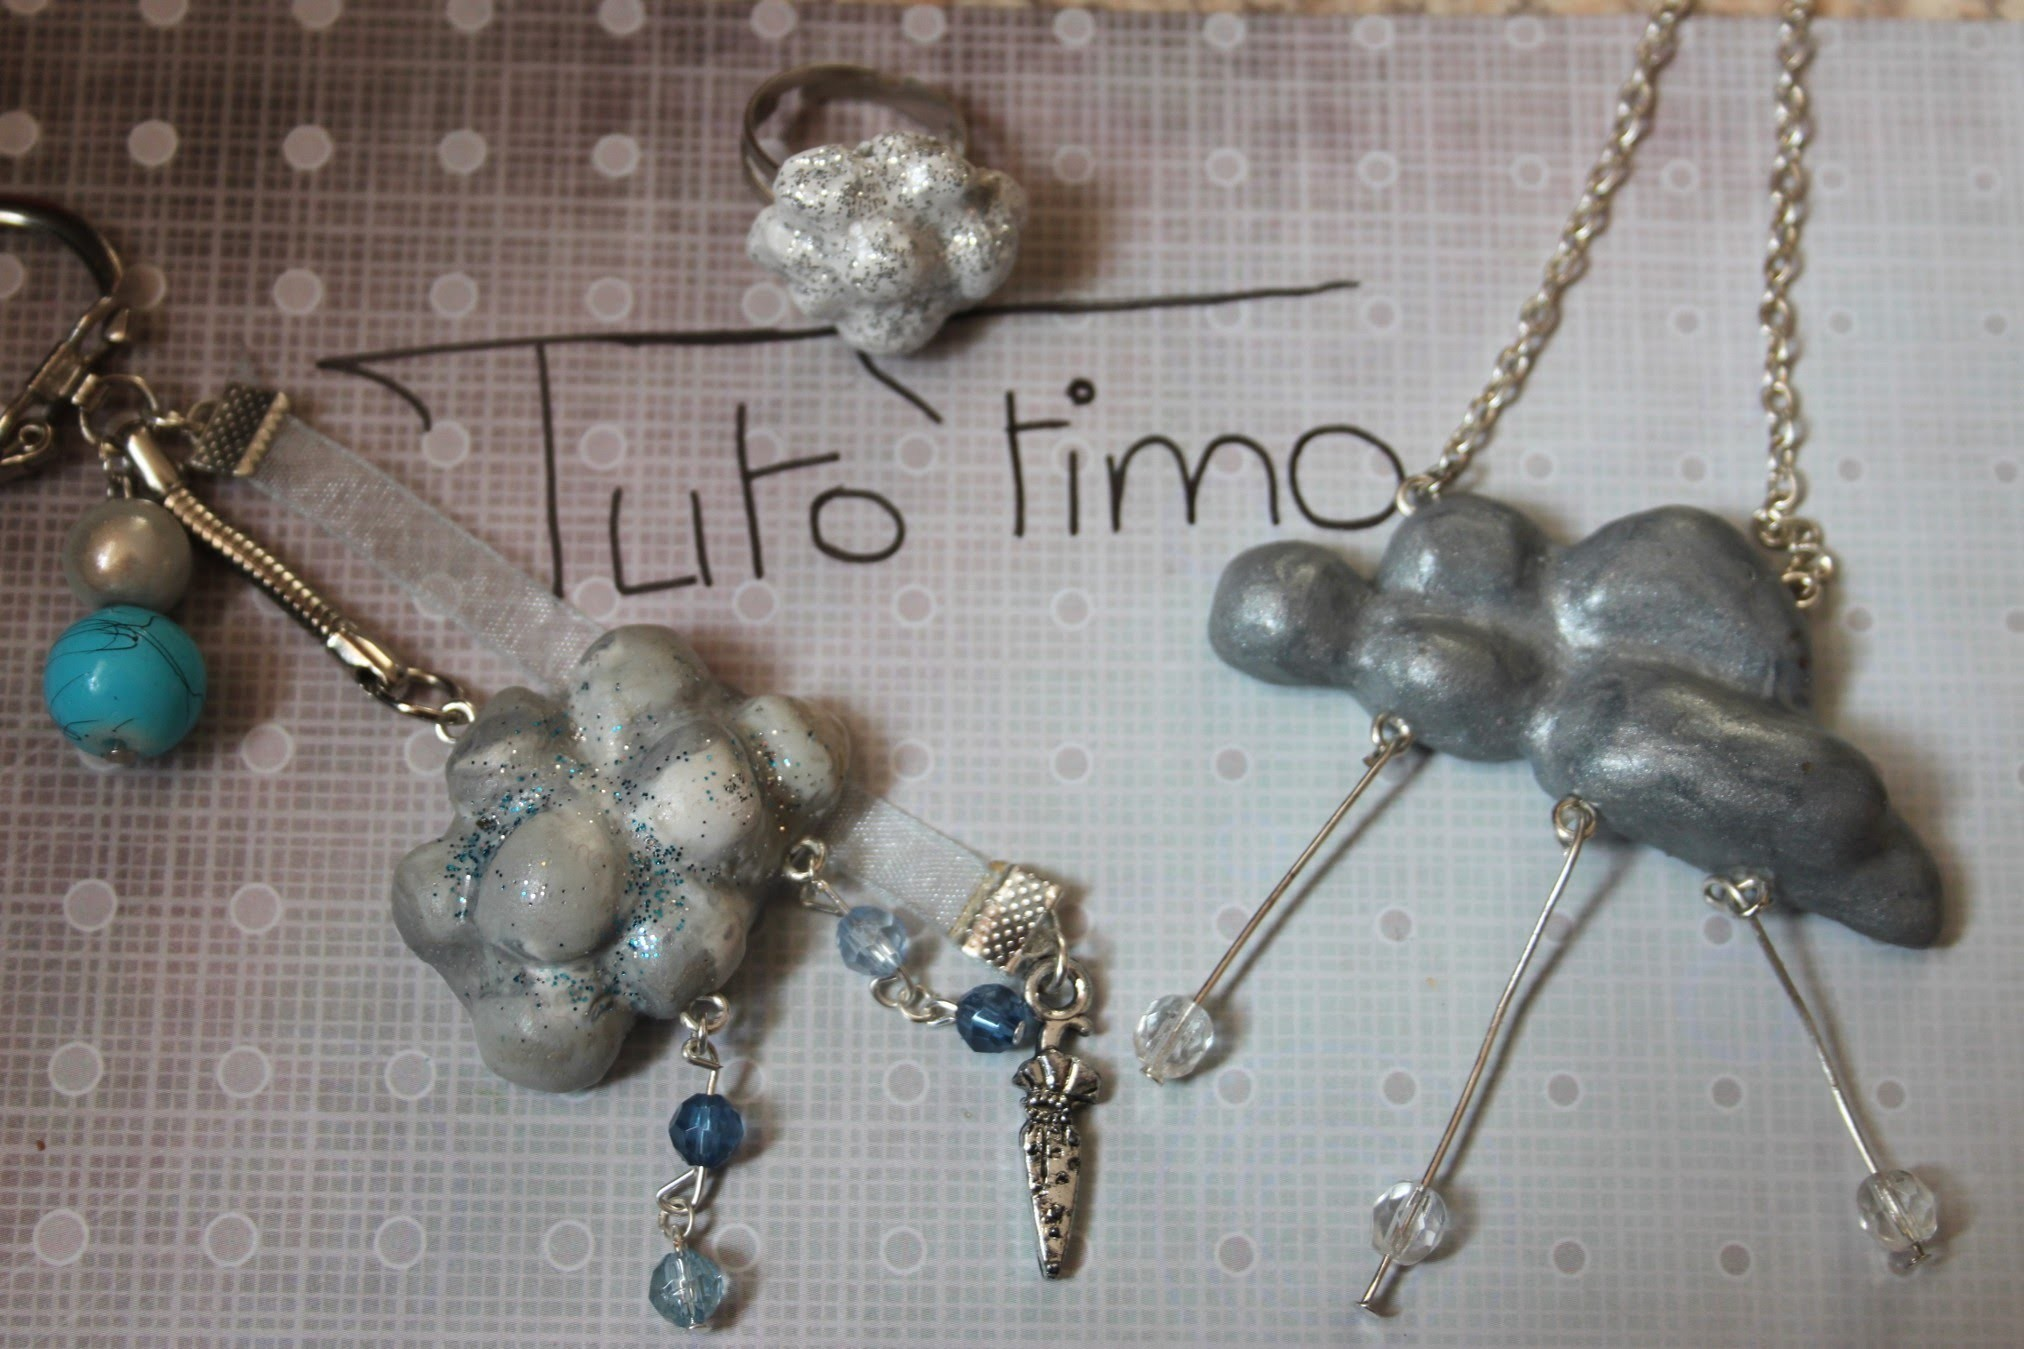 [♥✿ Tuto Fimo : Nuage ✿♥] ~ [♥✿ Polymer Clay Tutorial : Cloud ✿♥]